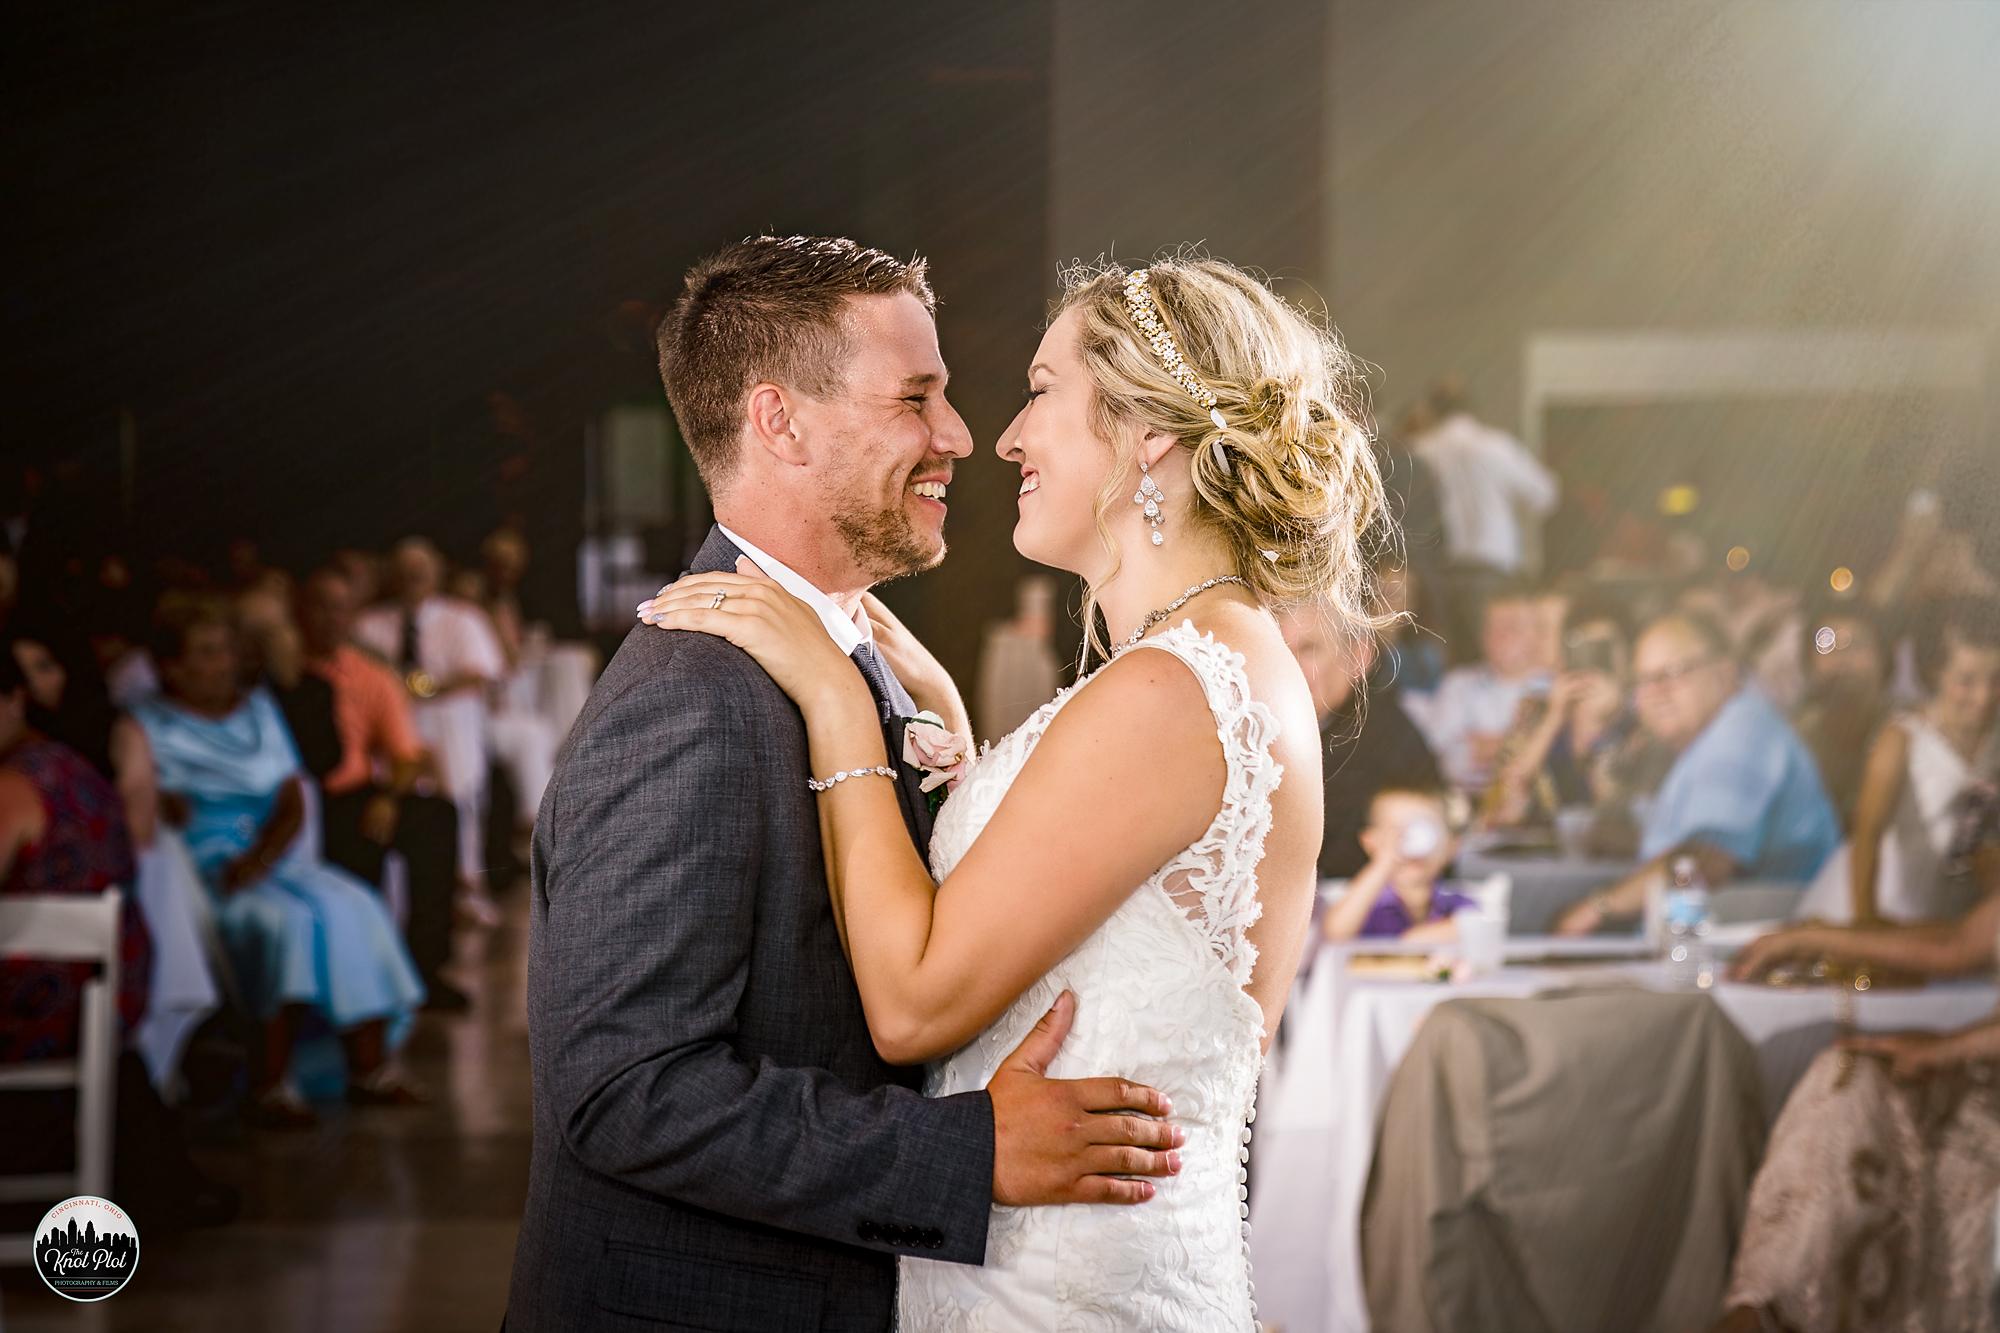 Southgate-Community-Center-KY-Wedding-Photography-21.jpg